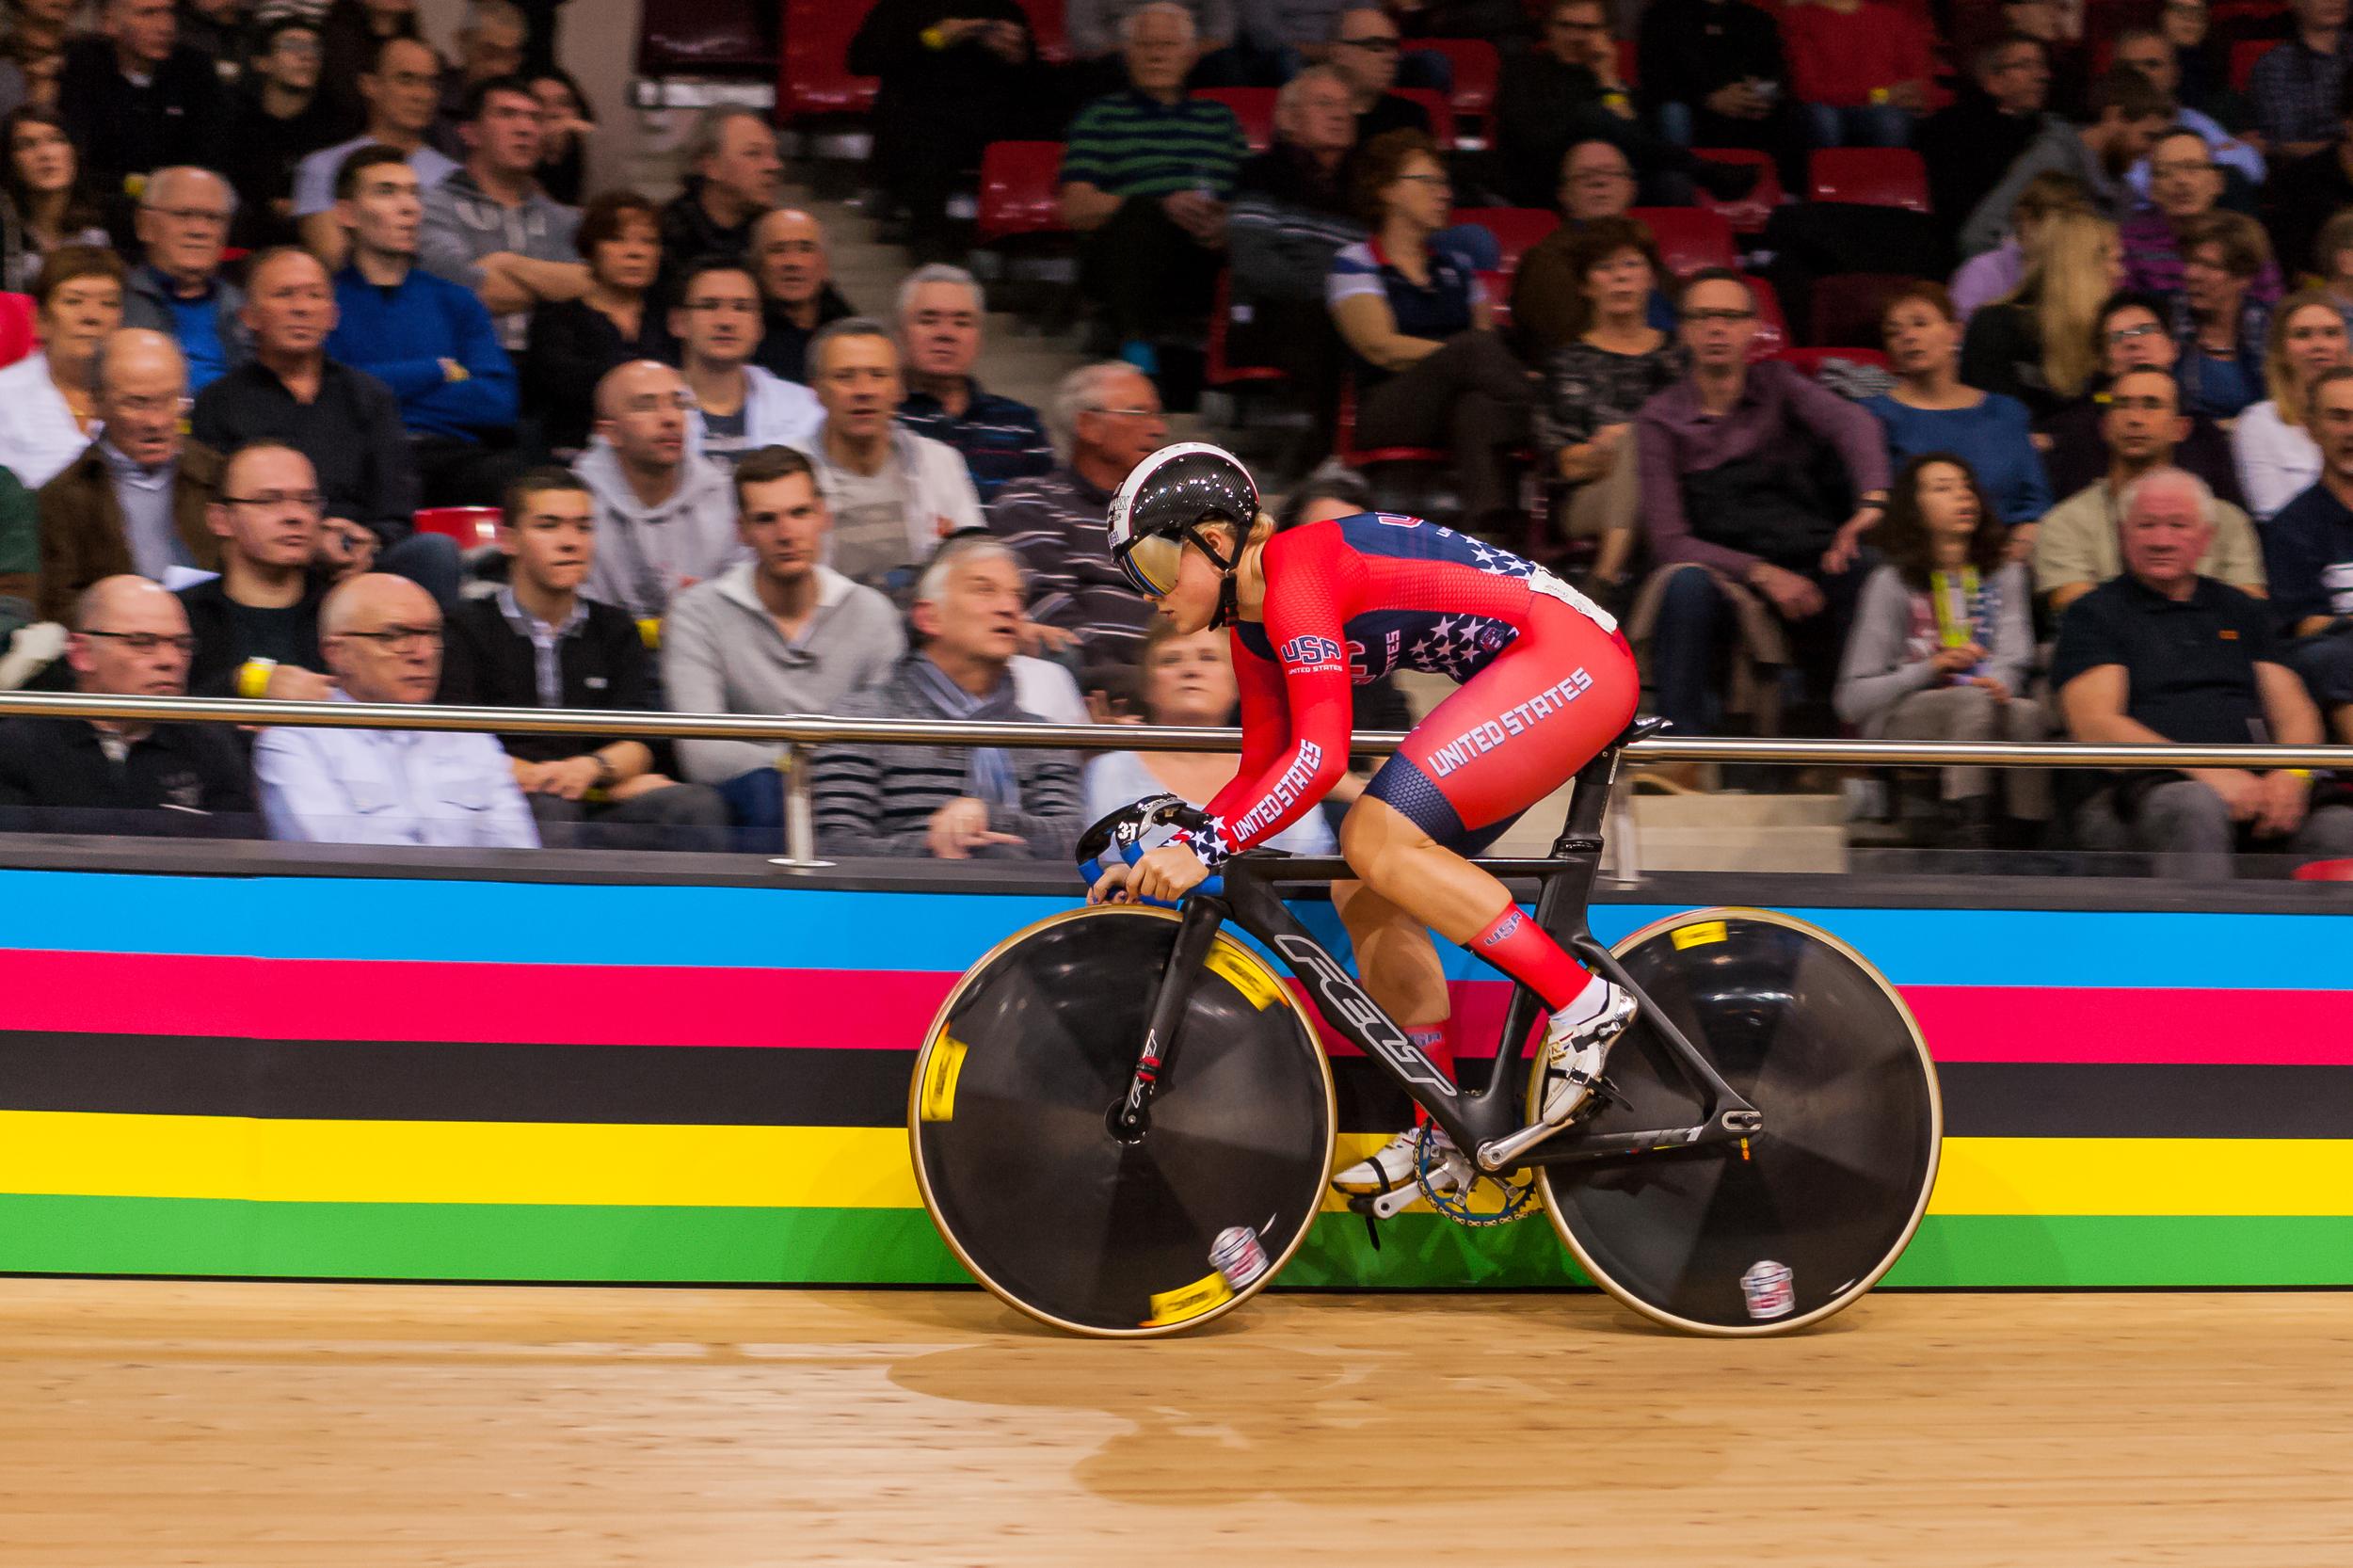 World Championships 2015 - Paris, France.